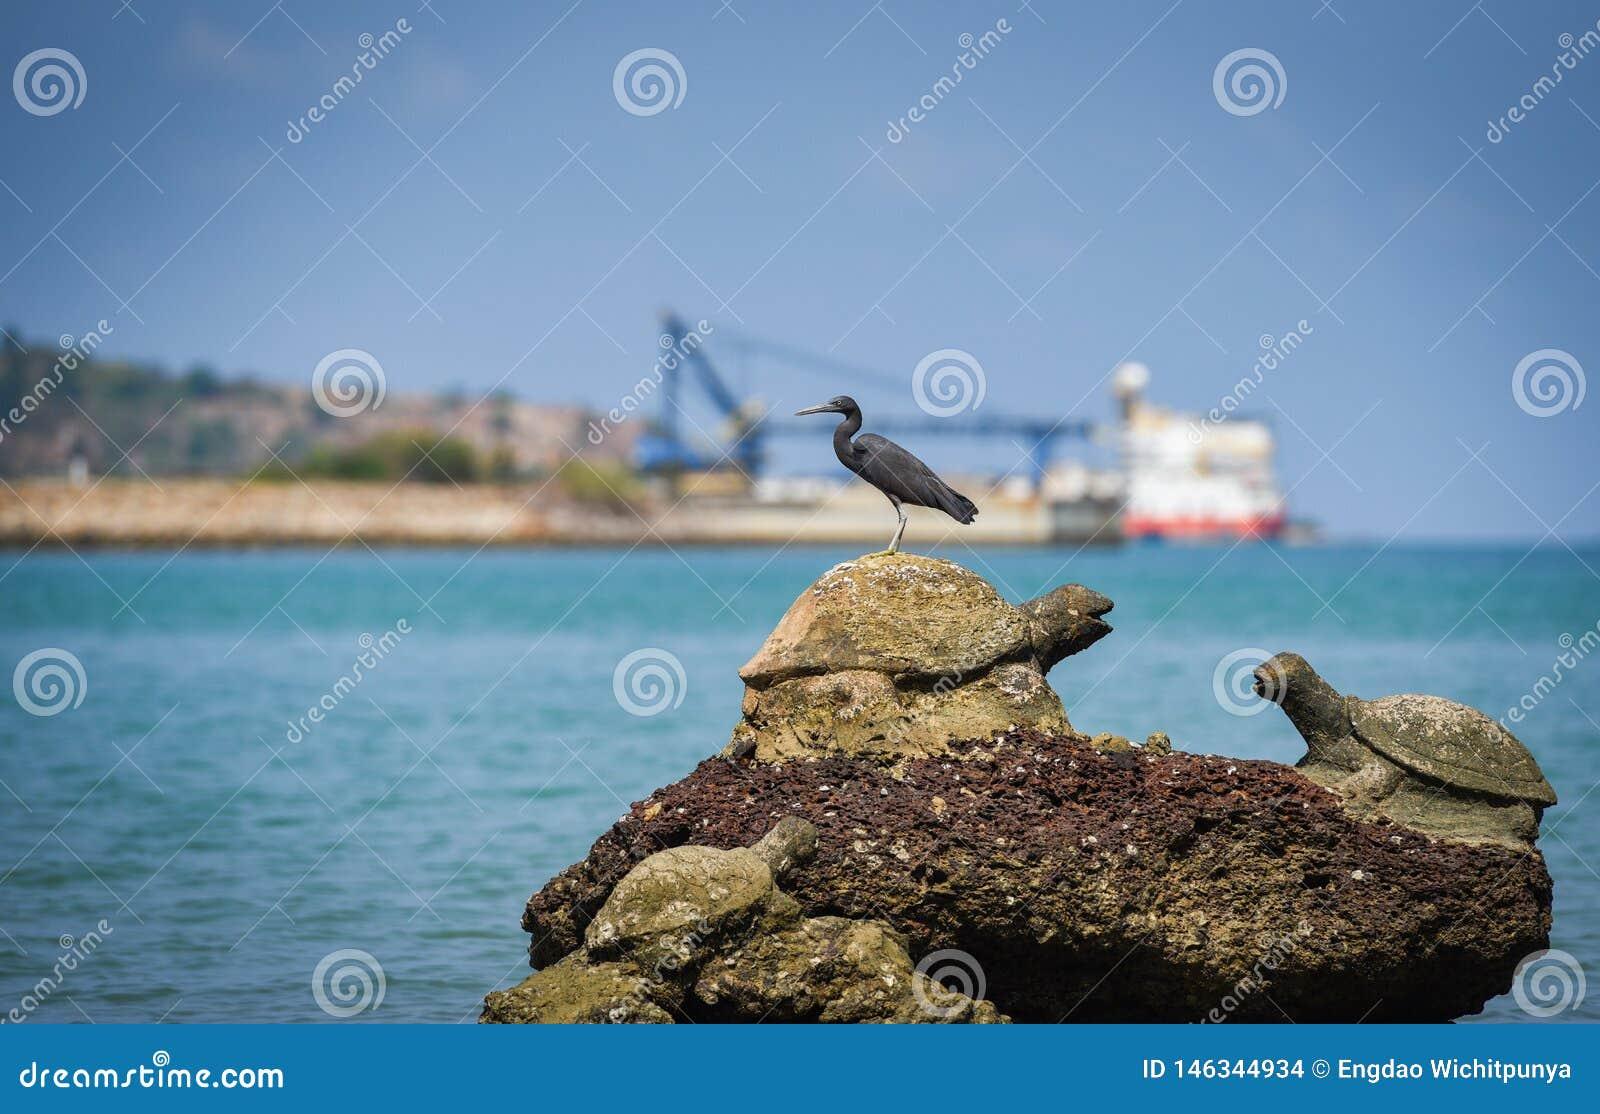 Bird on the rocks at bay coast sea ocean fishing boat background